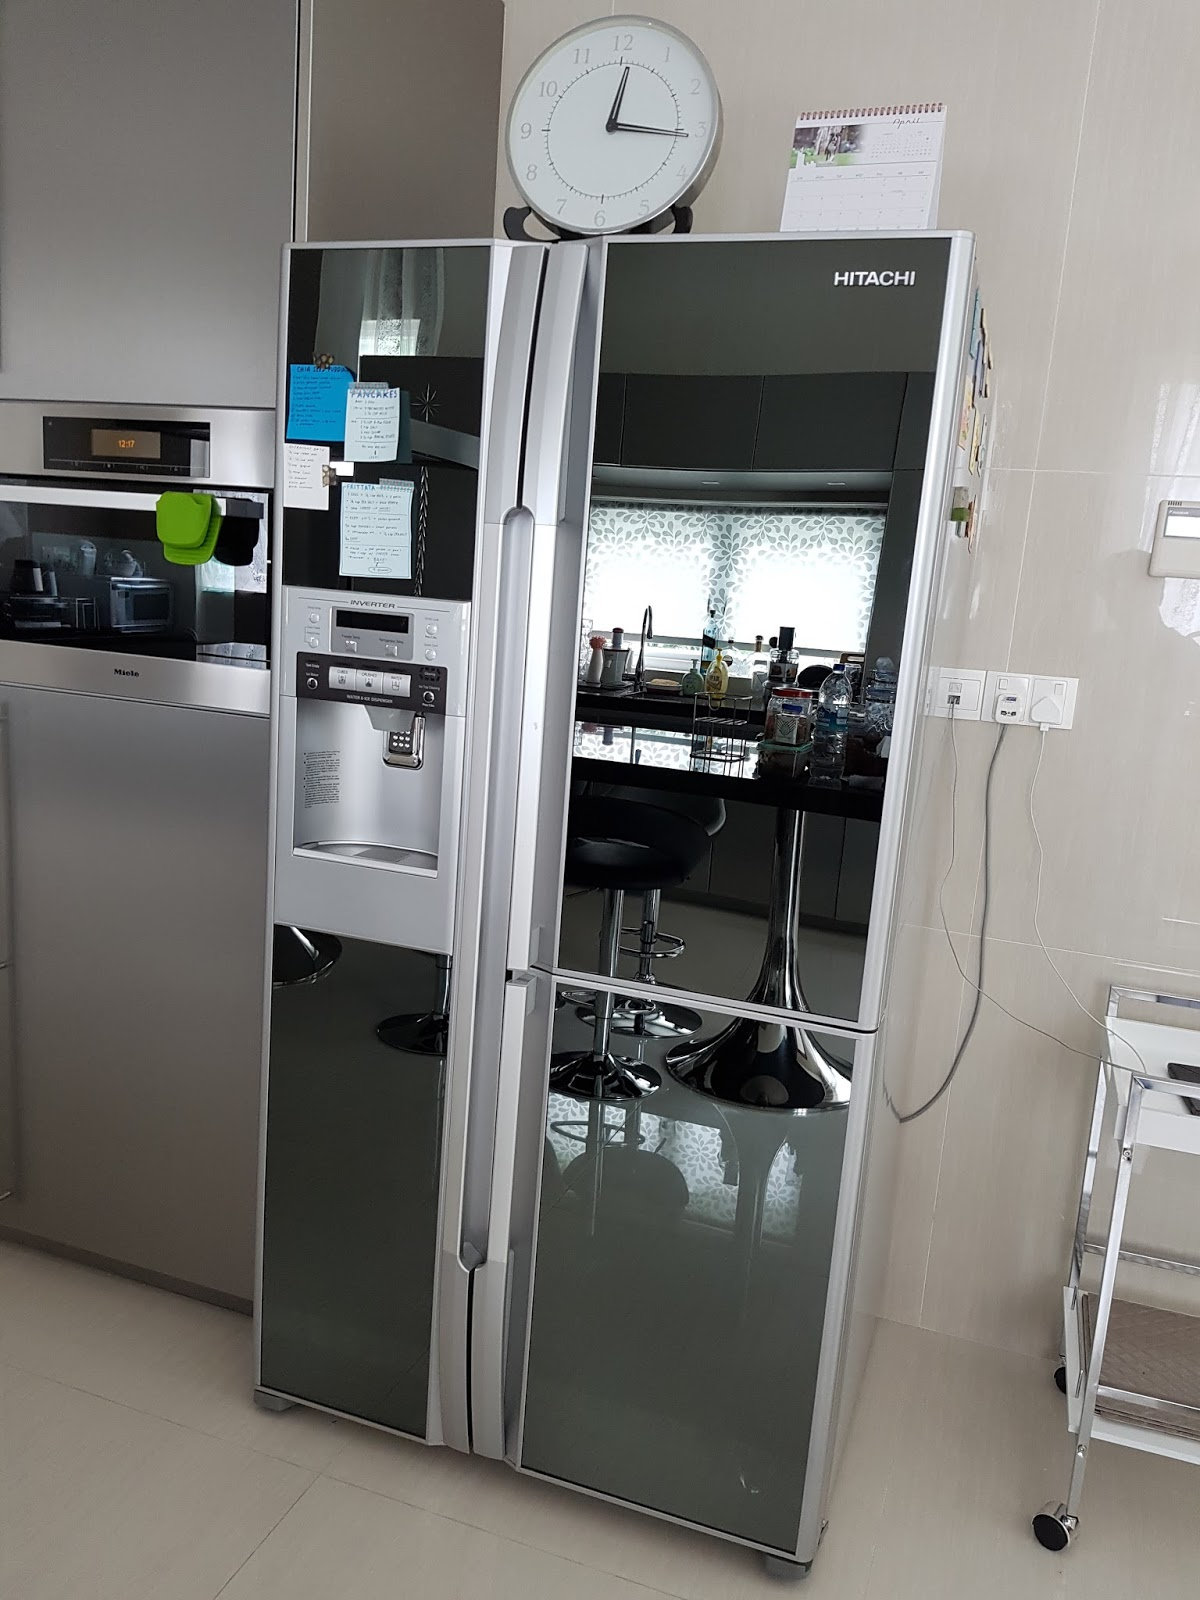 Fridge Repair Refrigerator Repair Singapore Hitachi